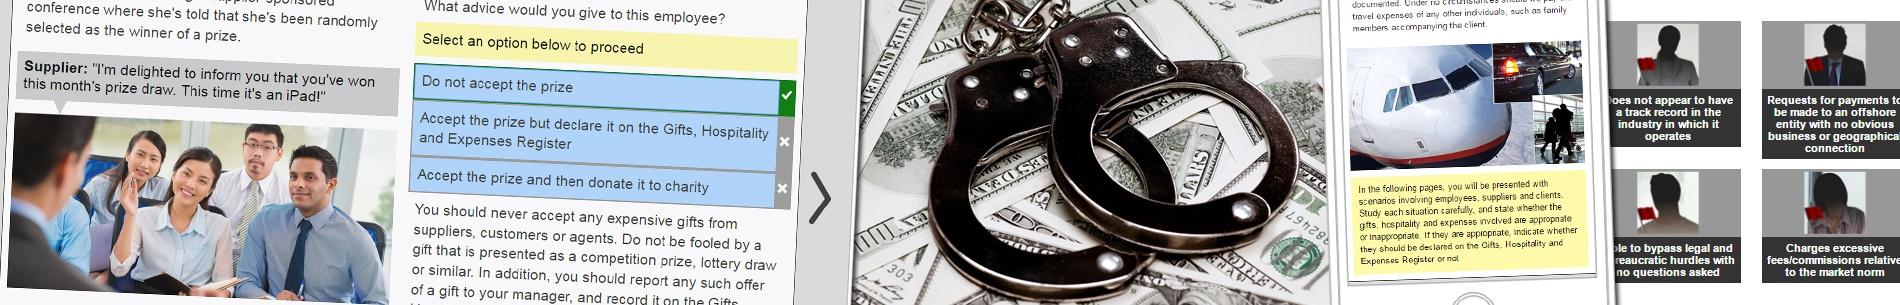 bribery training